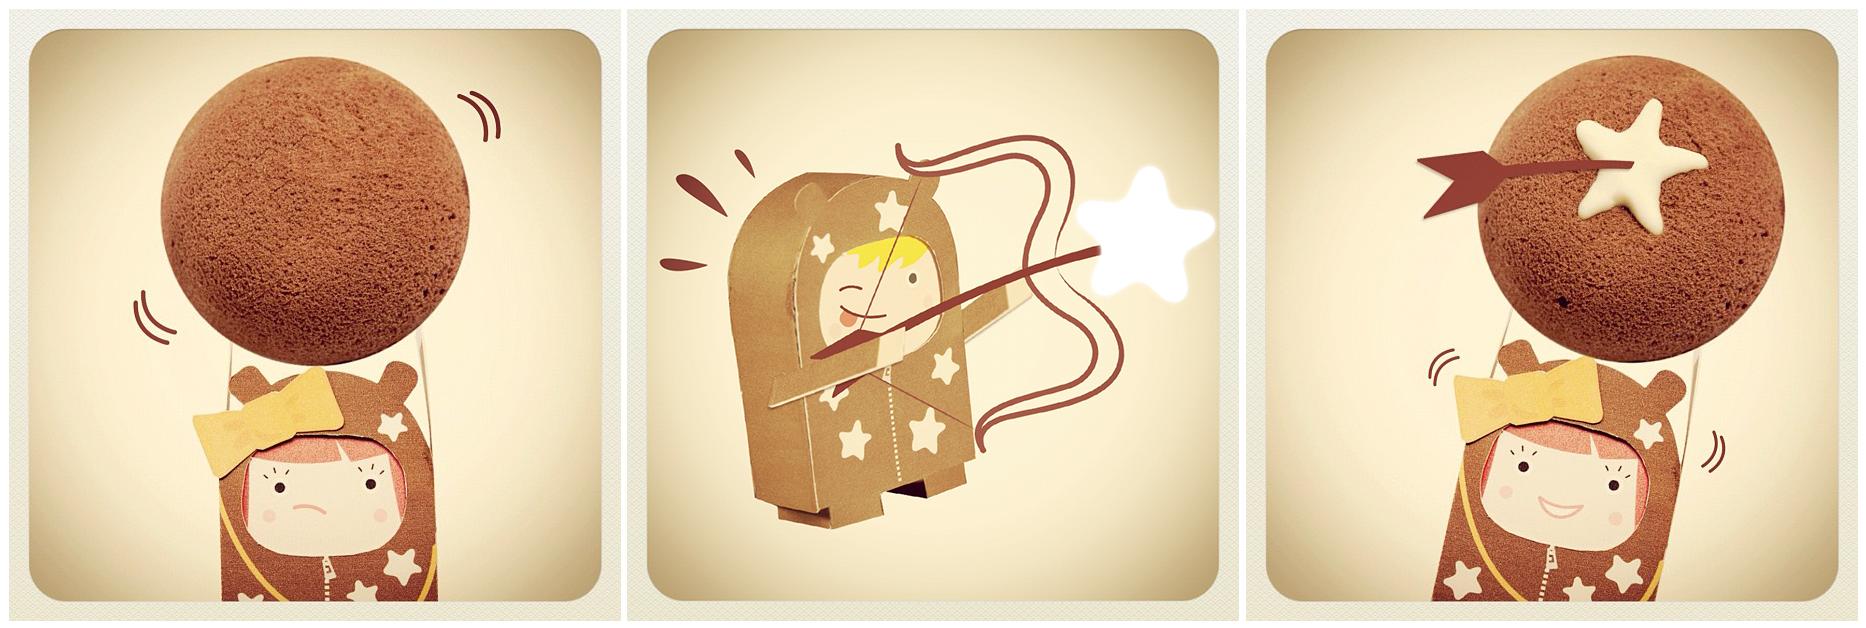 sweet arrow                                                                                                                         // Pan di Stelle